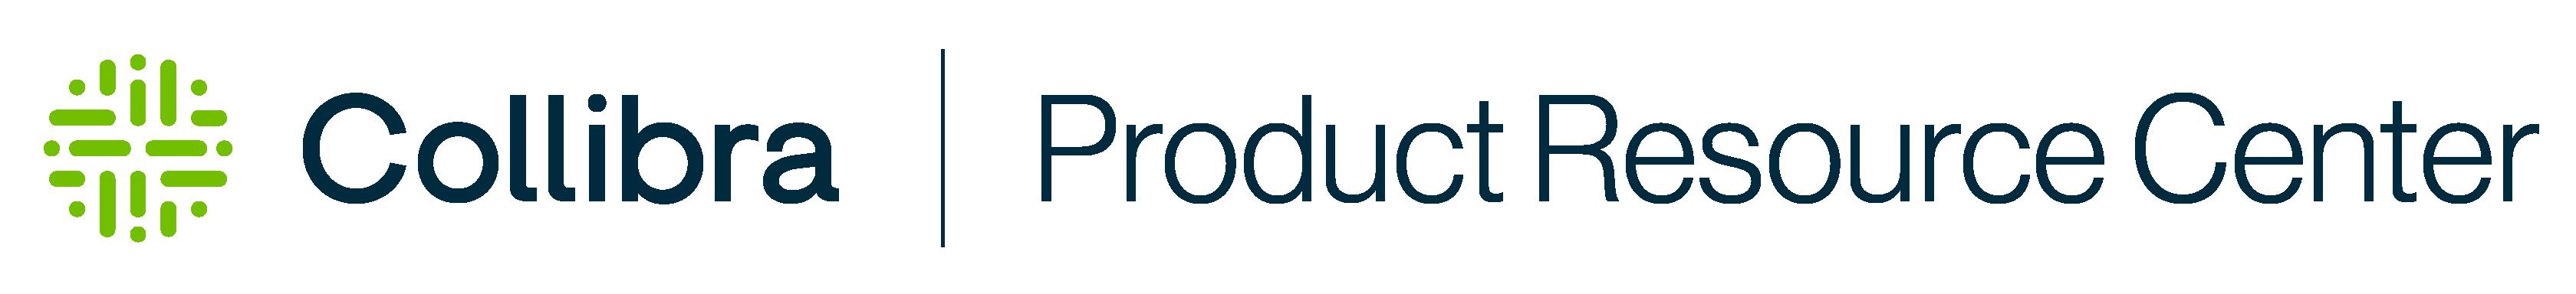 Collibra | Product Resource Center